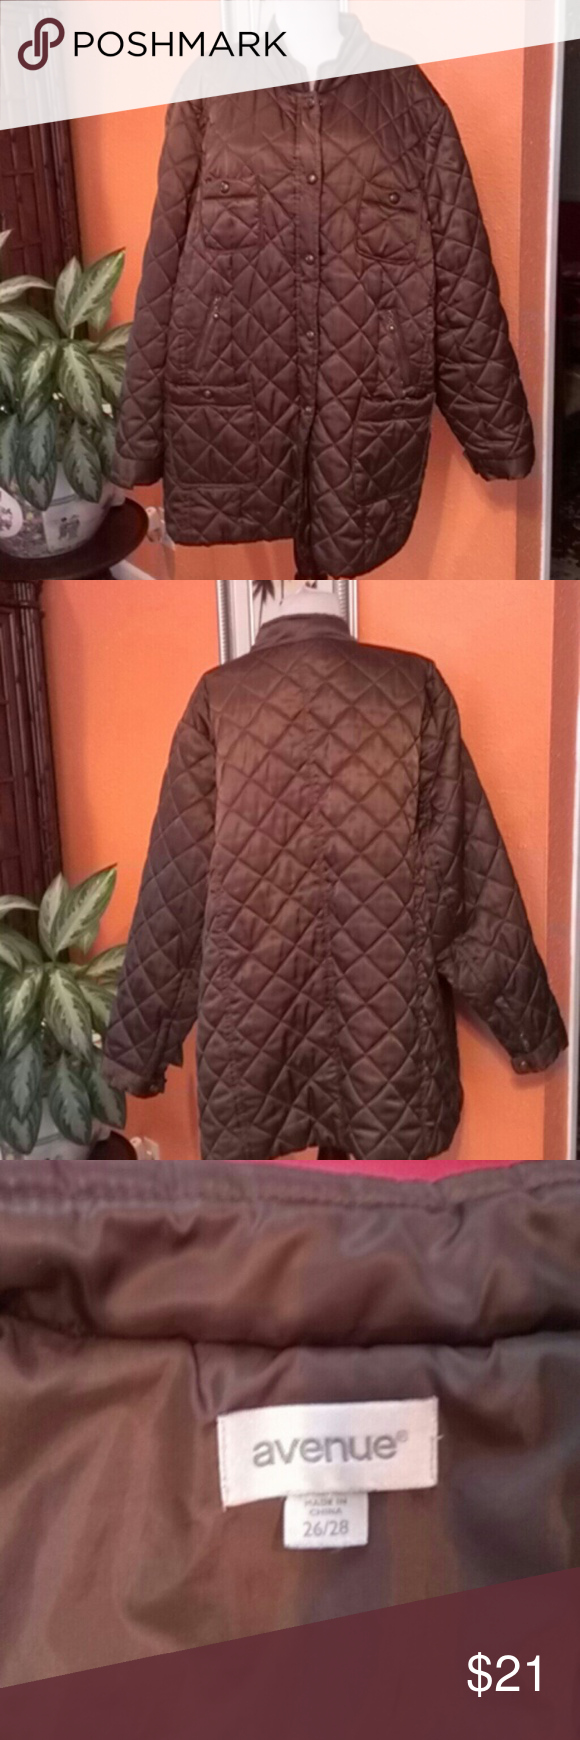 Jacket Avenue Jacket Avenue, shell, 100%polyester, lining, 100%polyester, filler, 100%polyester, color brown Avenue Jackets & Coats Jean Jackets